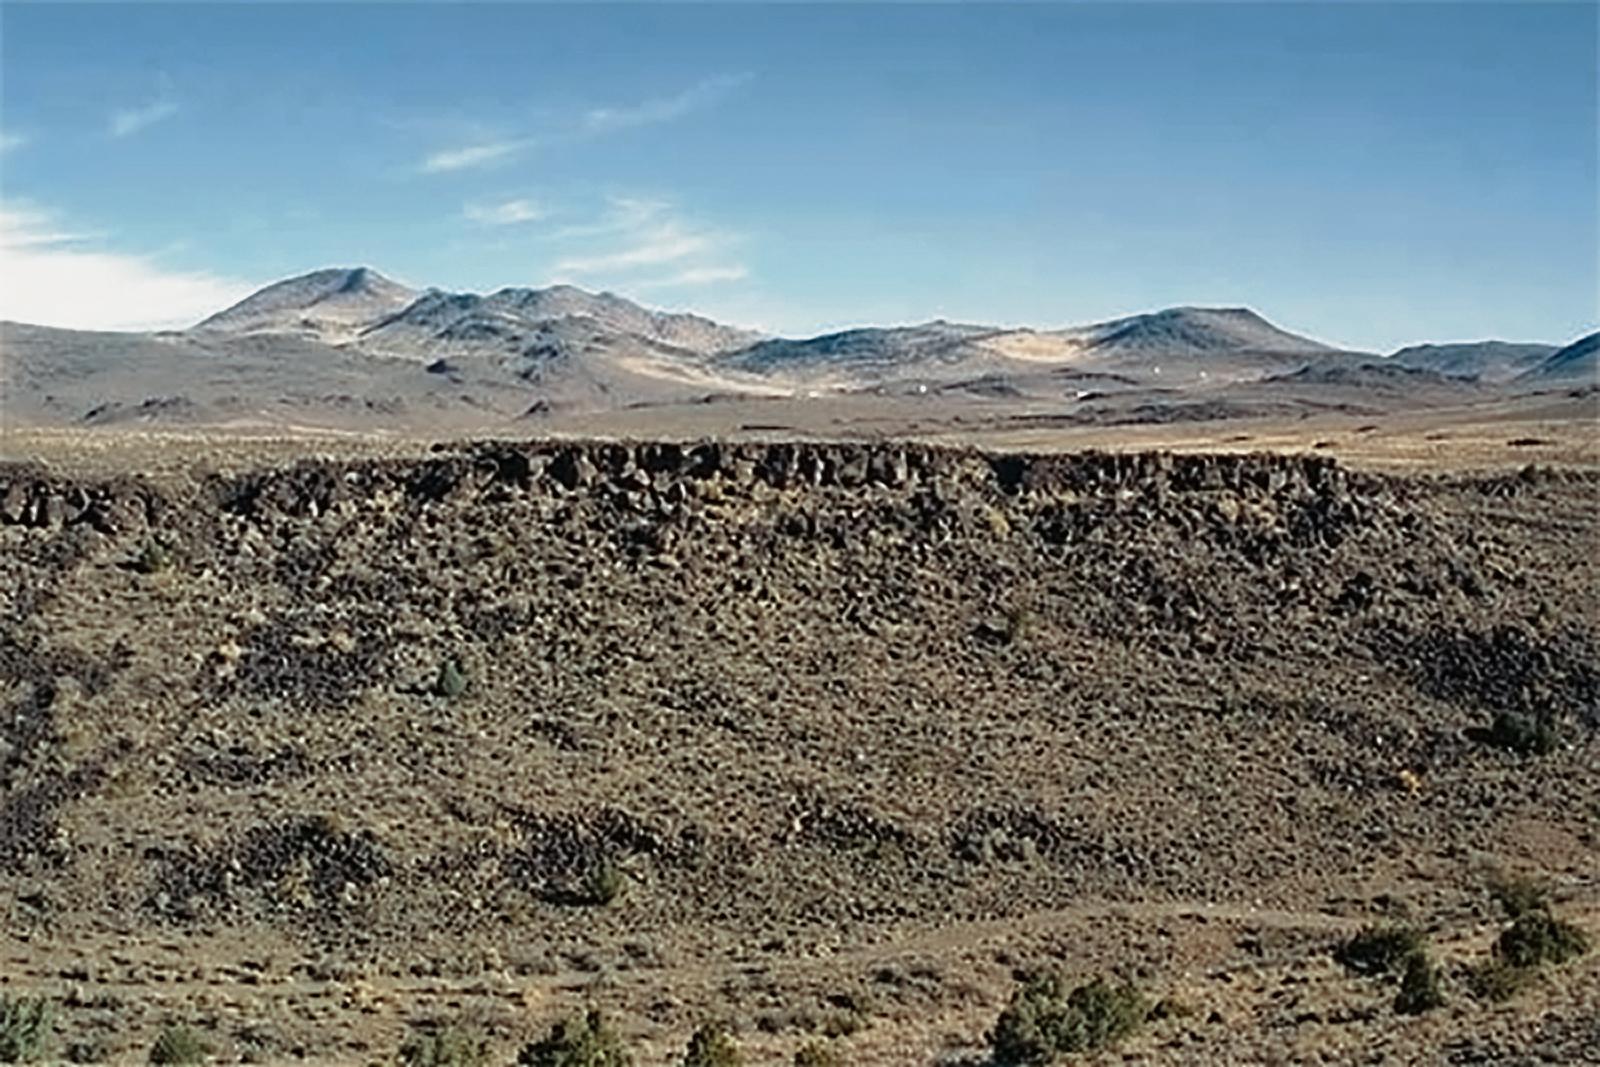 Lagomarsino Canyon Petroglyph Site Nevada Rock Art